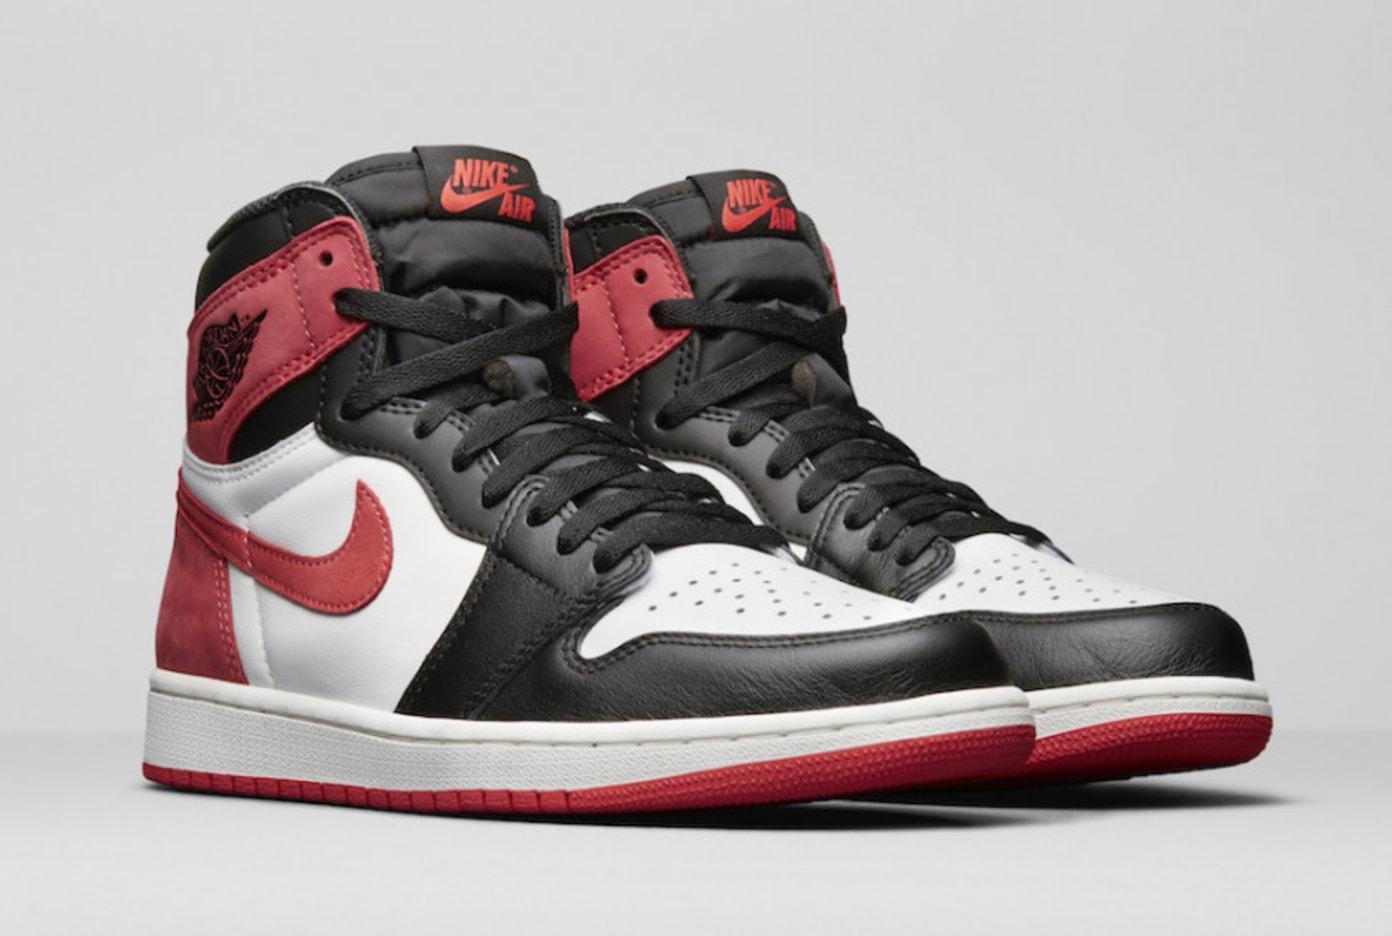 Nike Air Jordan 1 Retro High OG - NEW